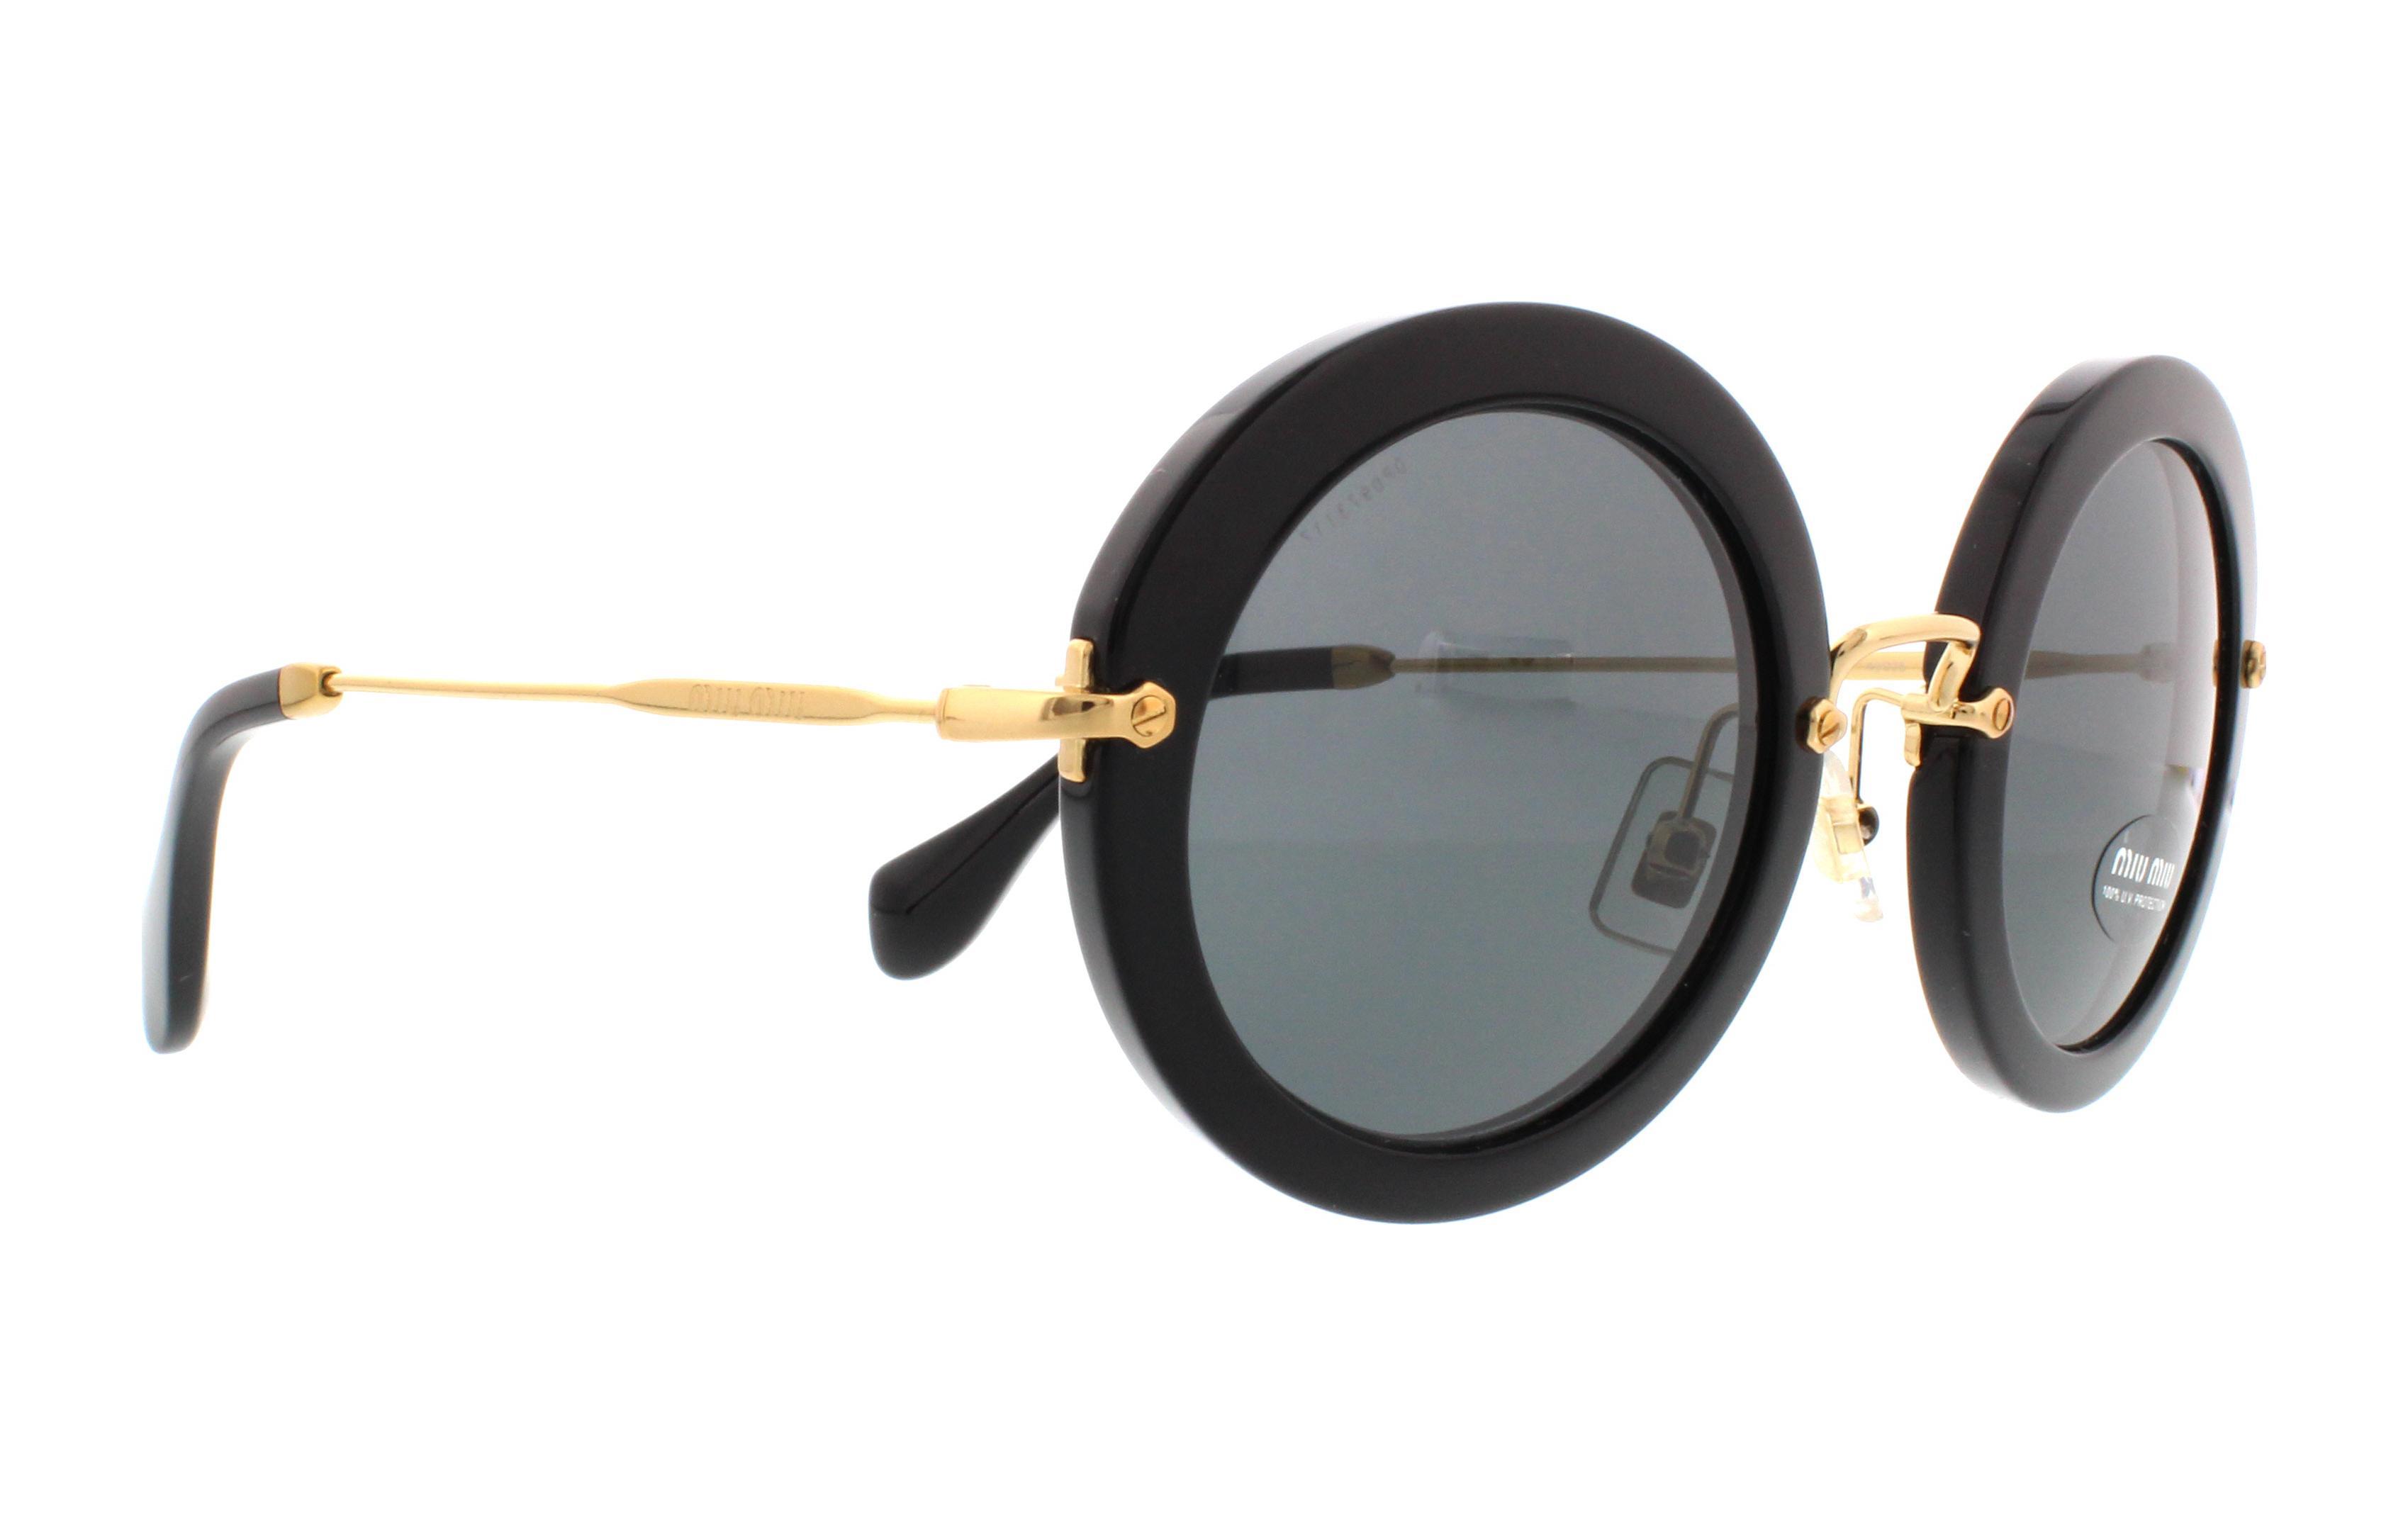 Miu Miu MU13NS Sonnenbrille Schwarz 1AB1A1 49mm XAdGtG